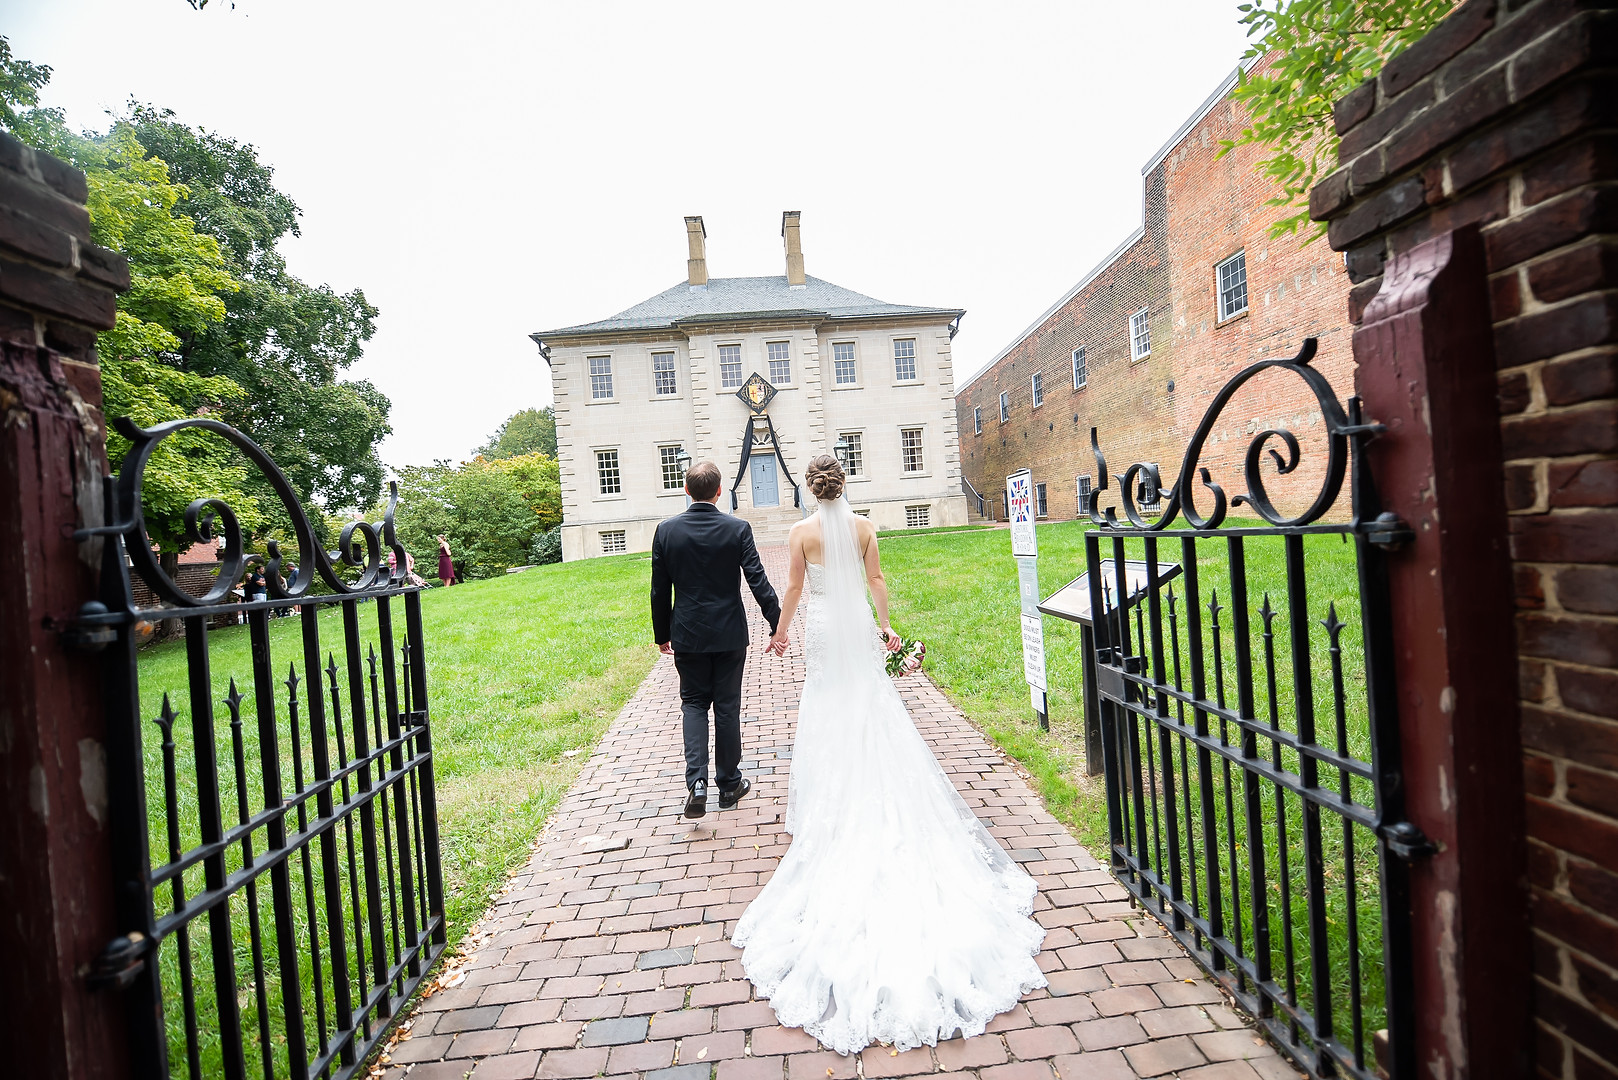 RachelAndrew-MountVernonInn-Wedding-661.